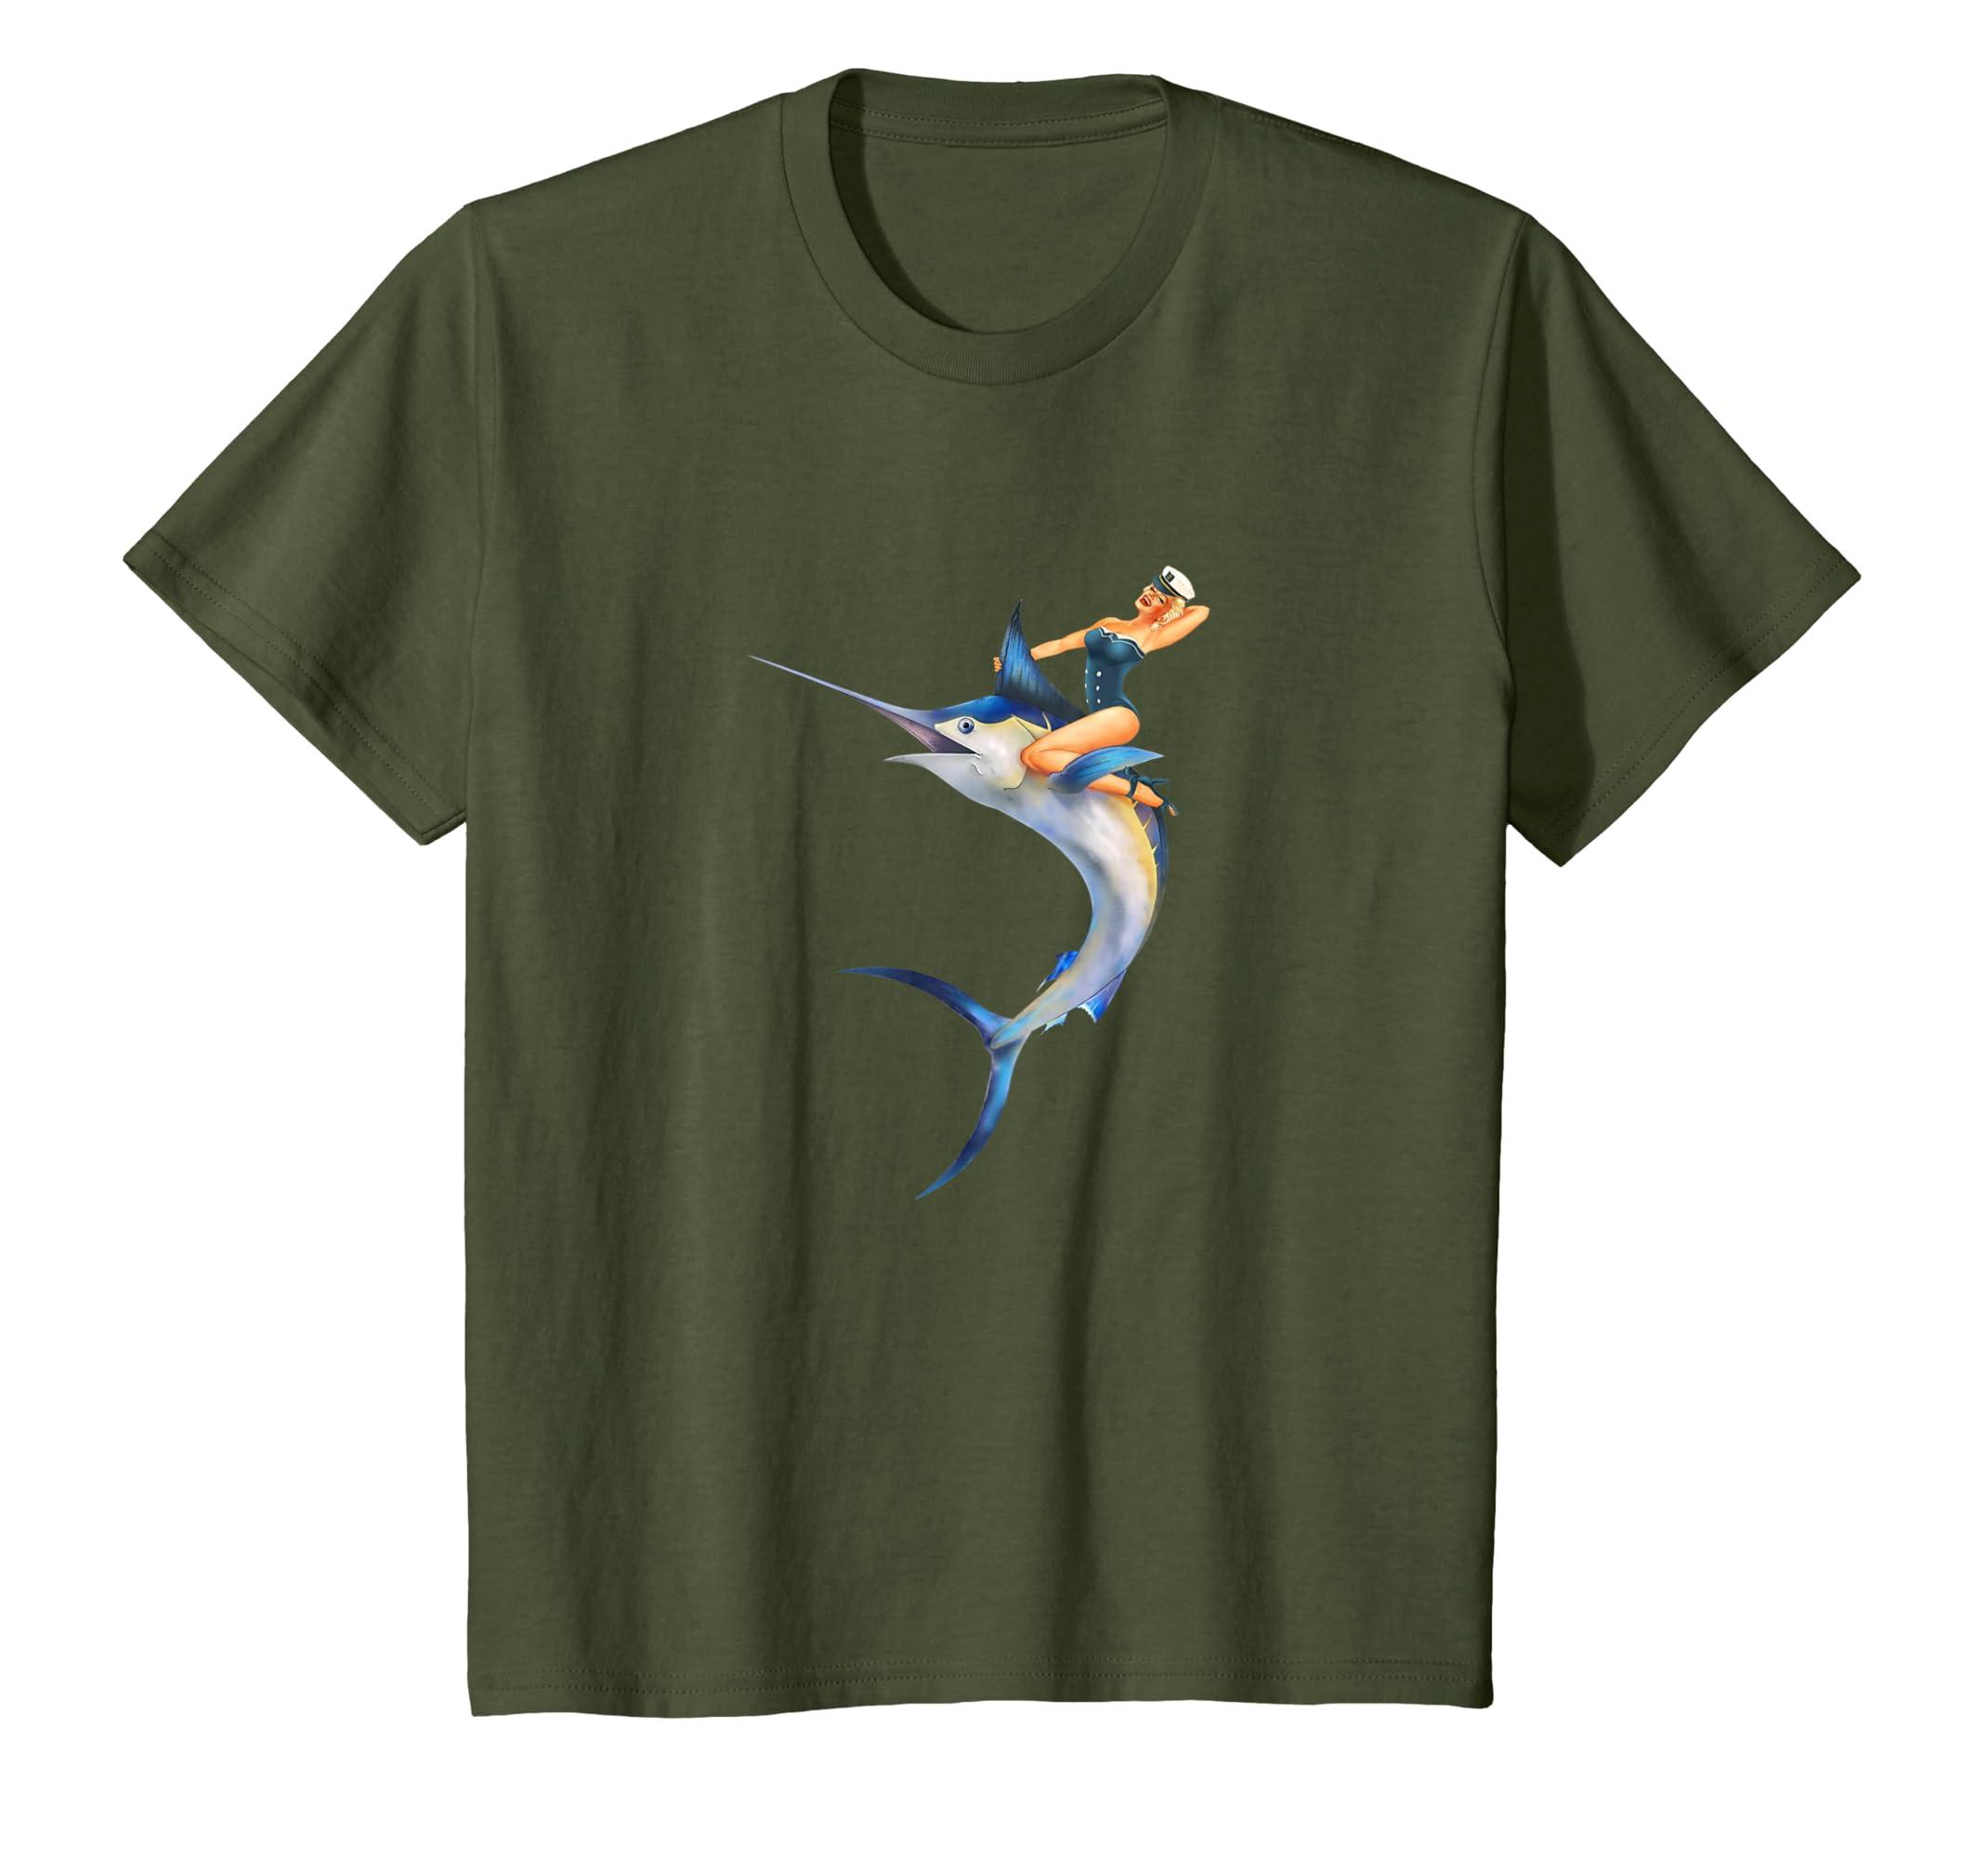 f55113f1c8 Amazon.com: Pin Up Sailor Girl Deep Sea Sport Fishing Gift T-Shirt: Clothing